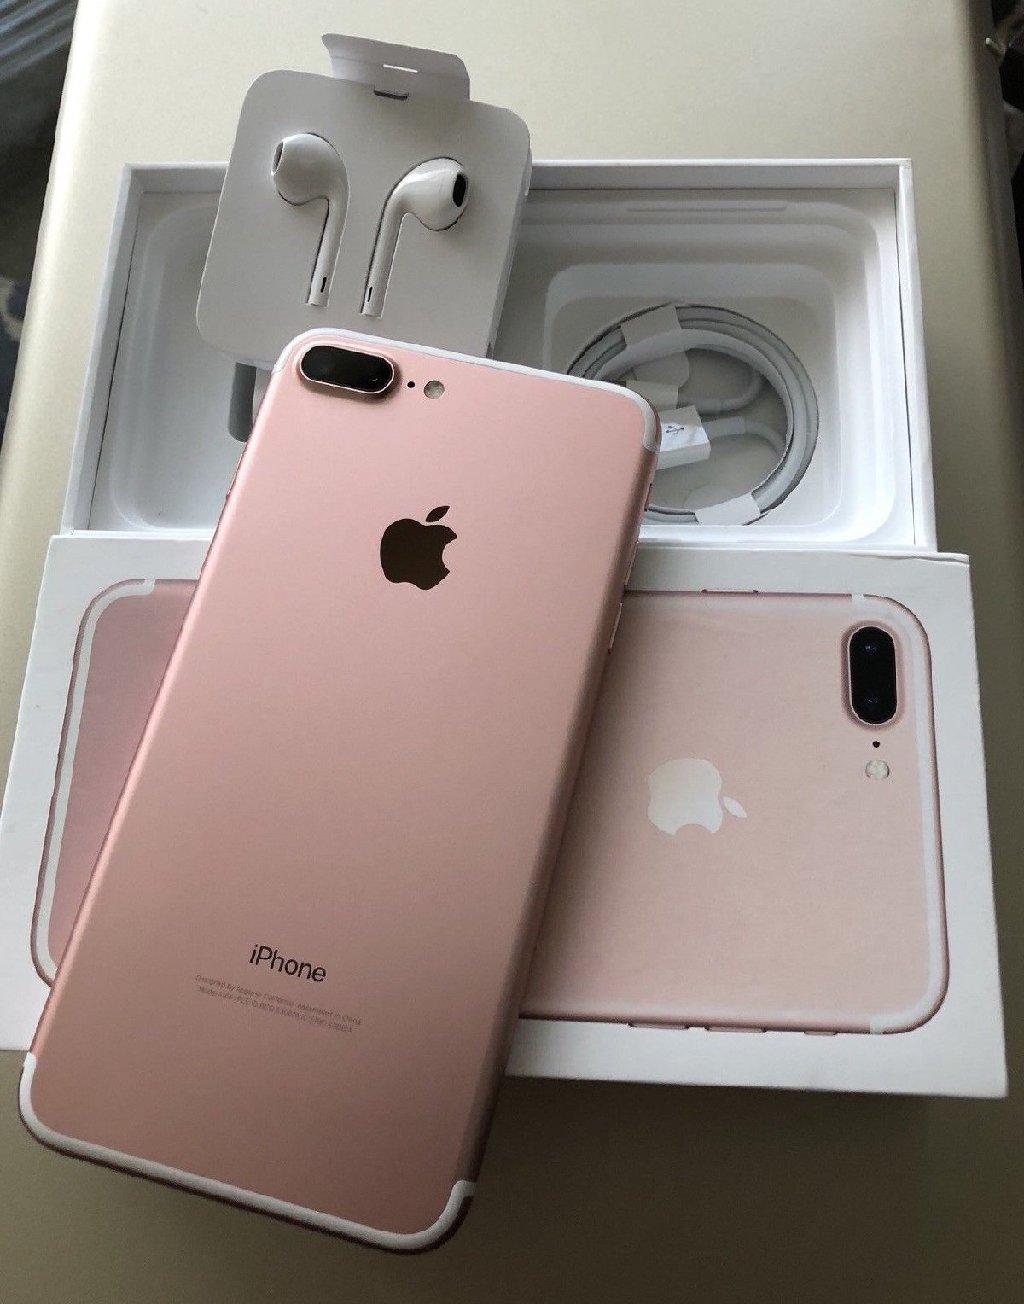 Apple iPhone 7 Plus brand new